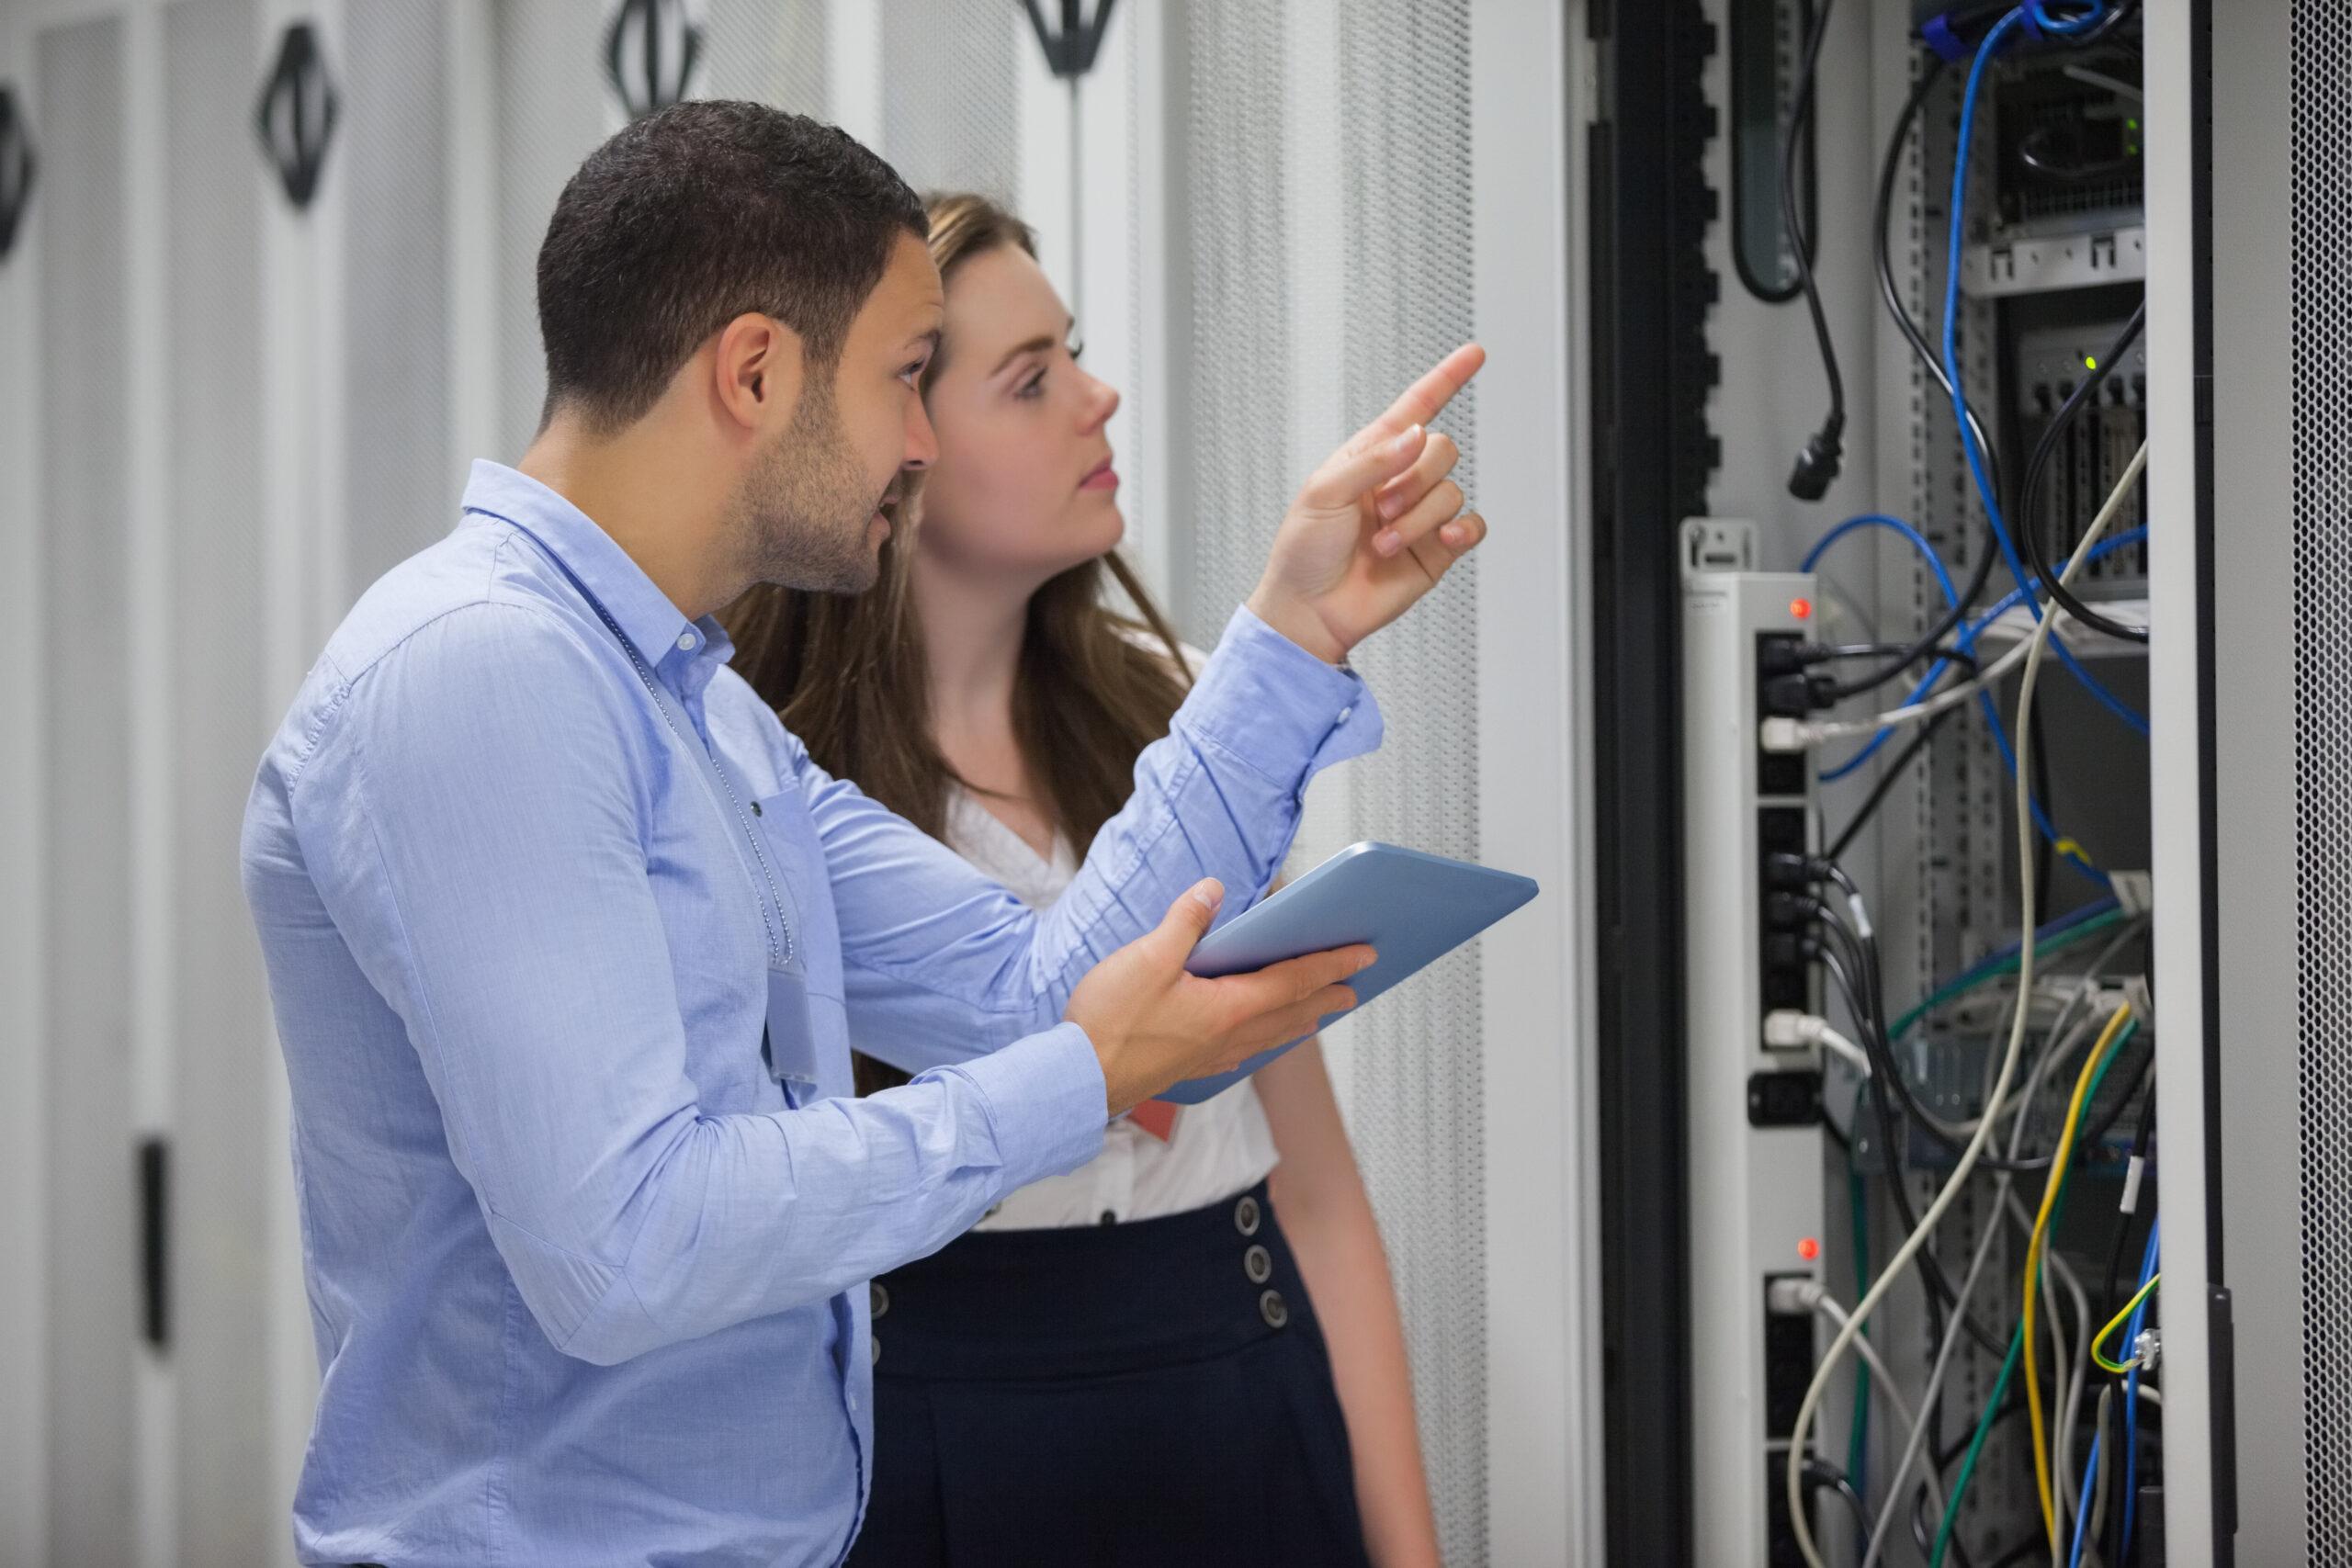 Installation Technicians